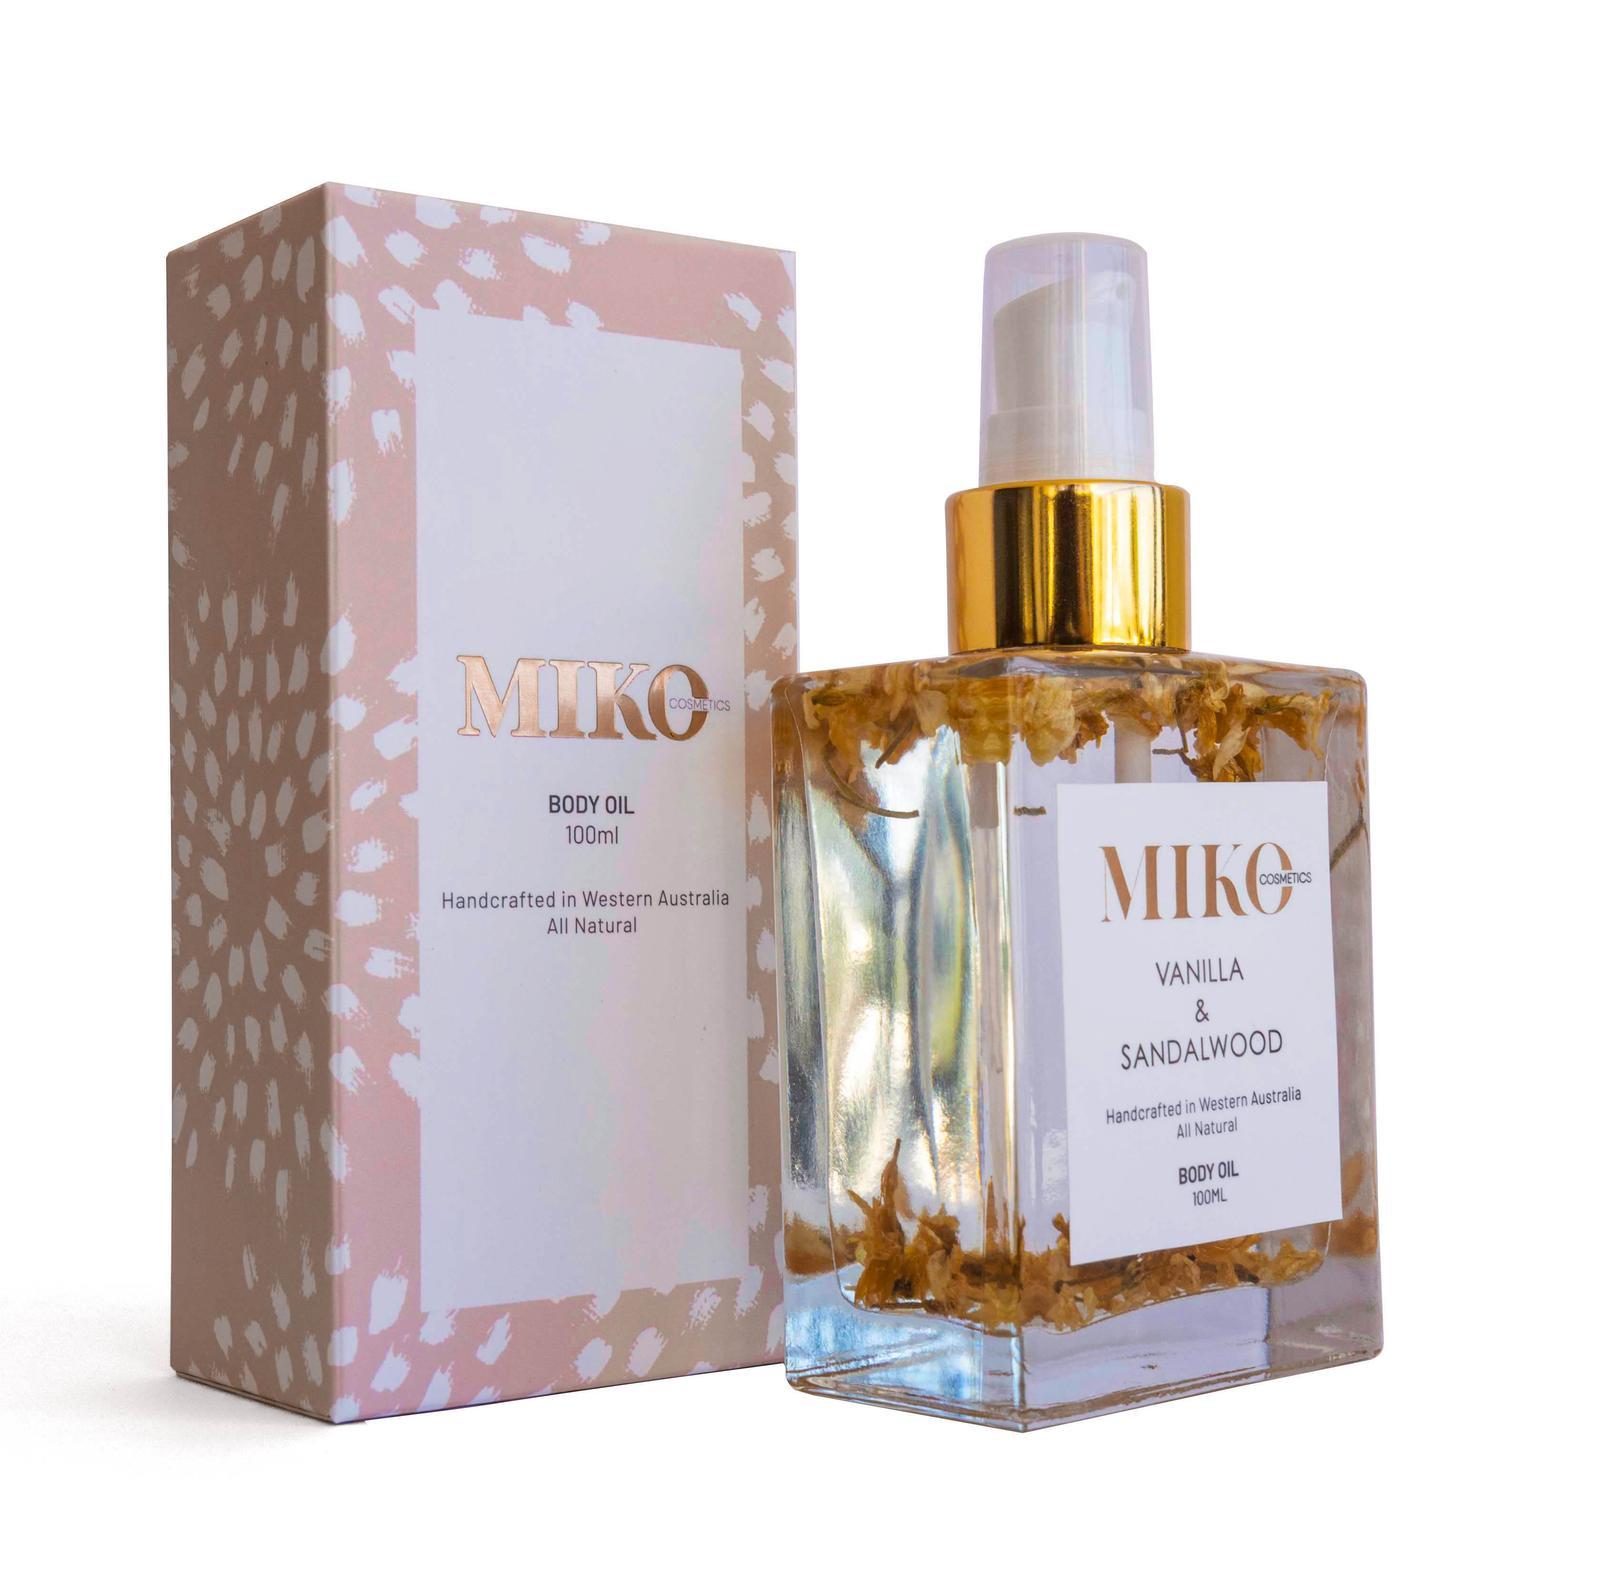 Sandalwood and Vanilla body oil